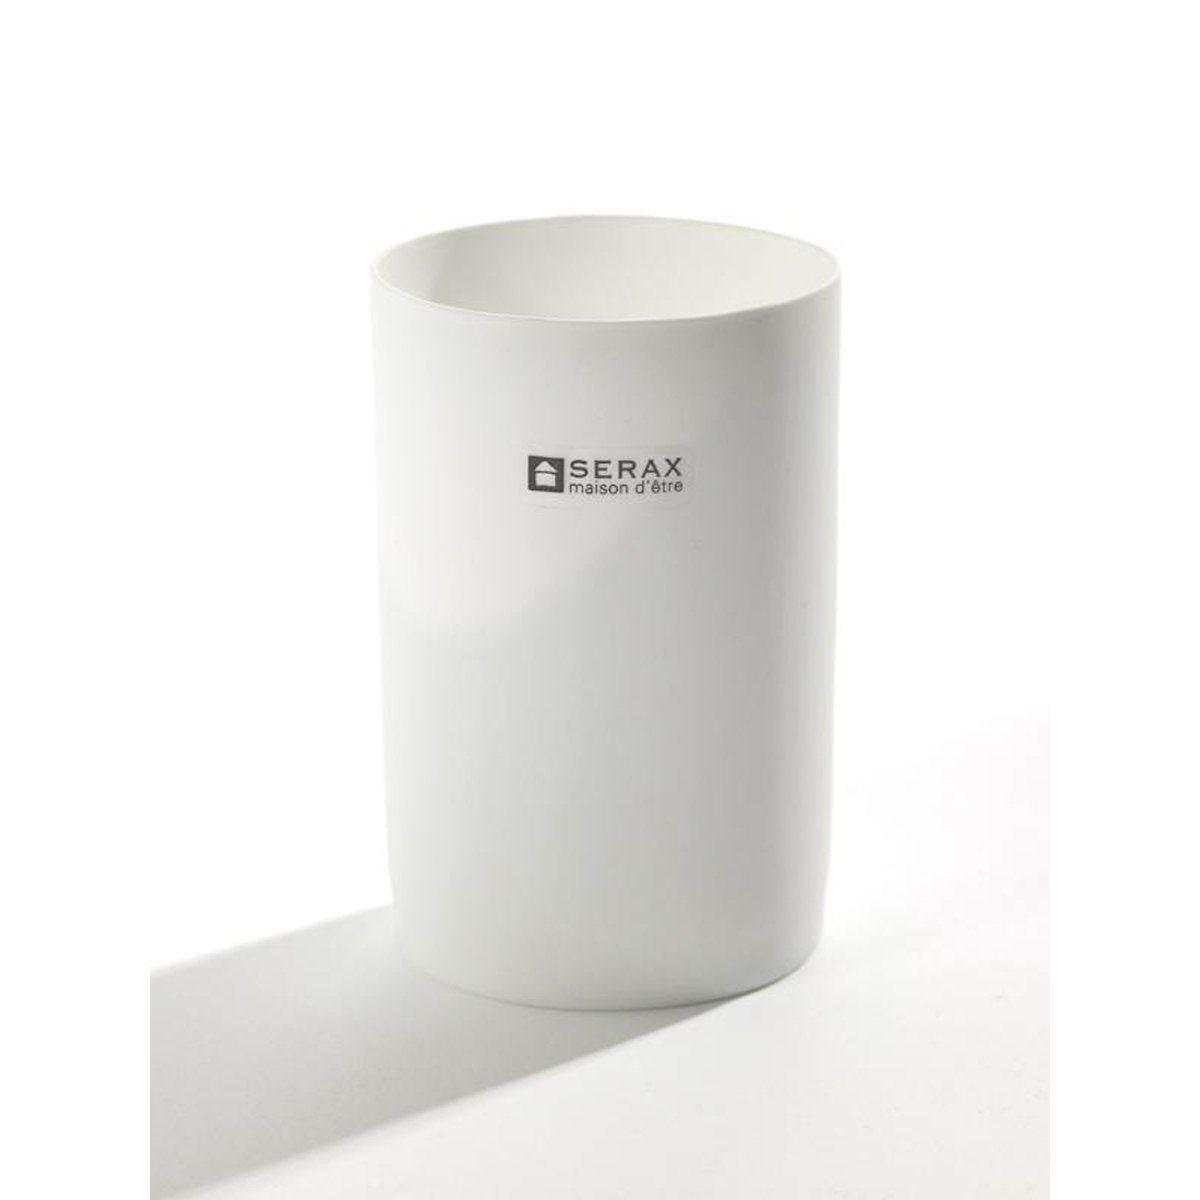 Serax Serax Teelichthalter Porzelan fein Standard